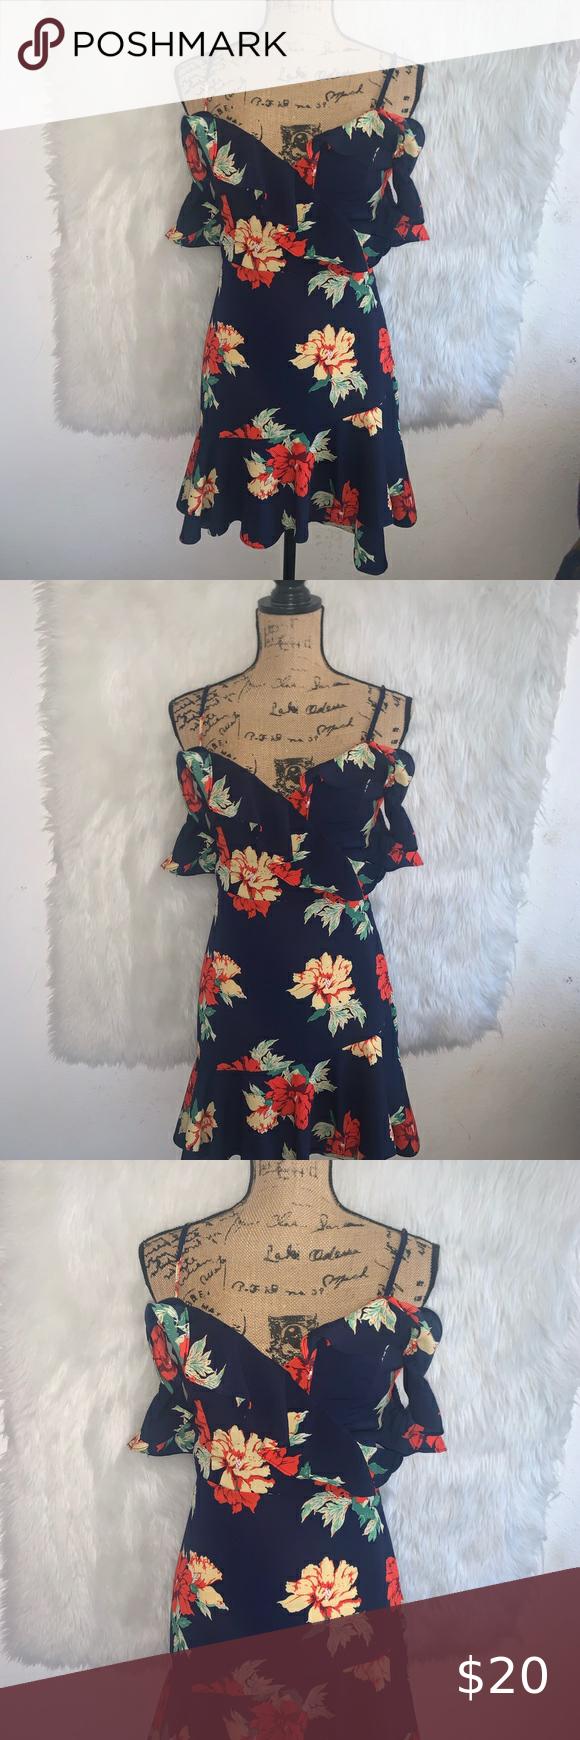 Floral Print Off Shoulder Dress Size Small Cute Summer Dresses Off Shoulder Dress Off Shoulder [ 1740 x 580 Pixel ]